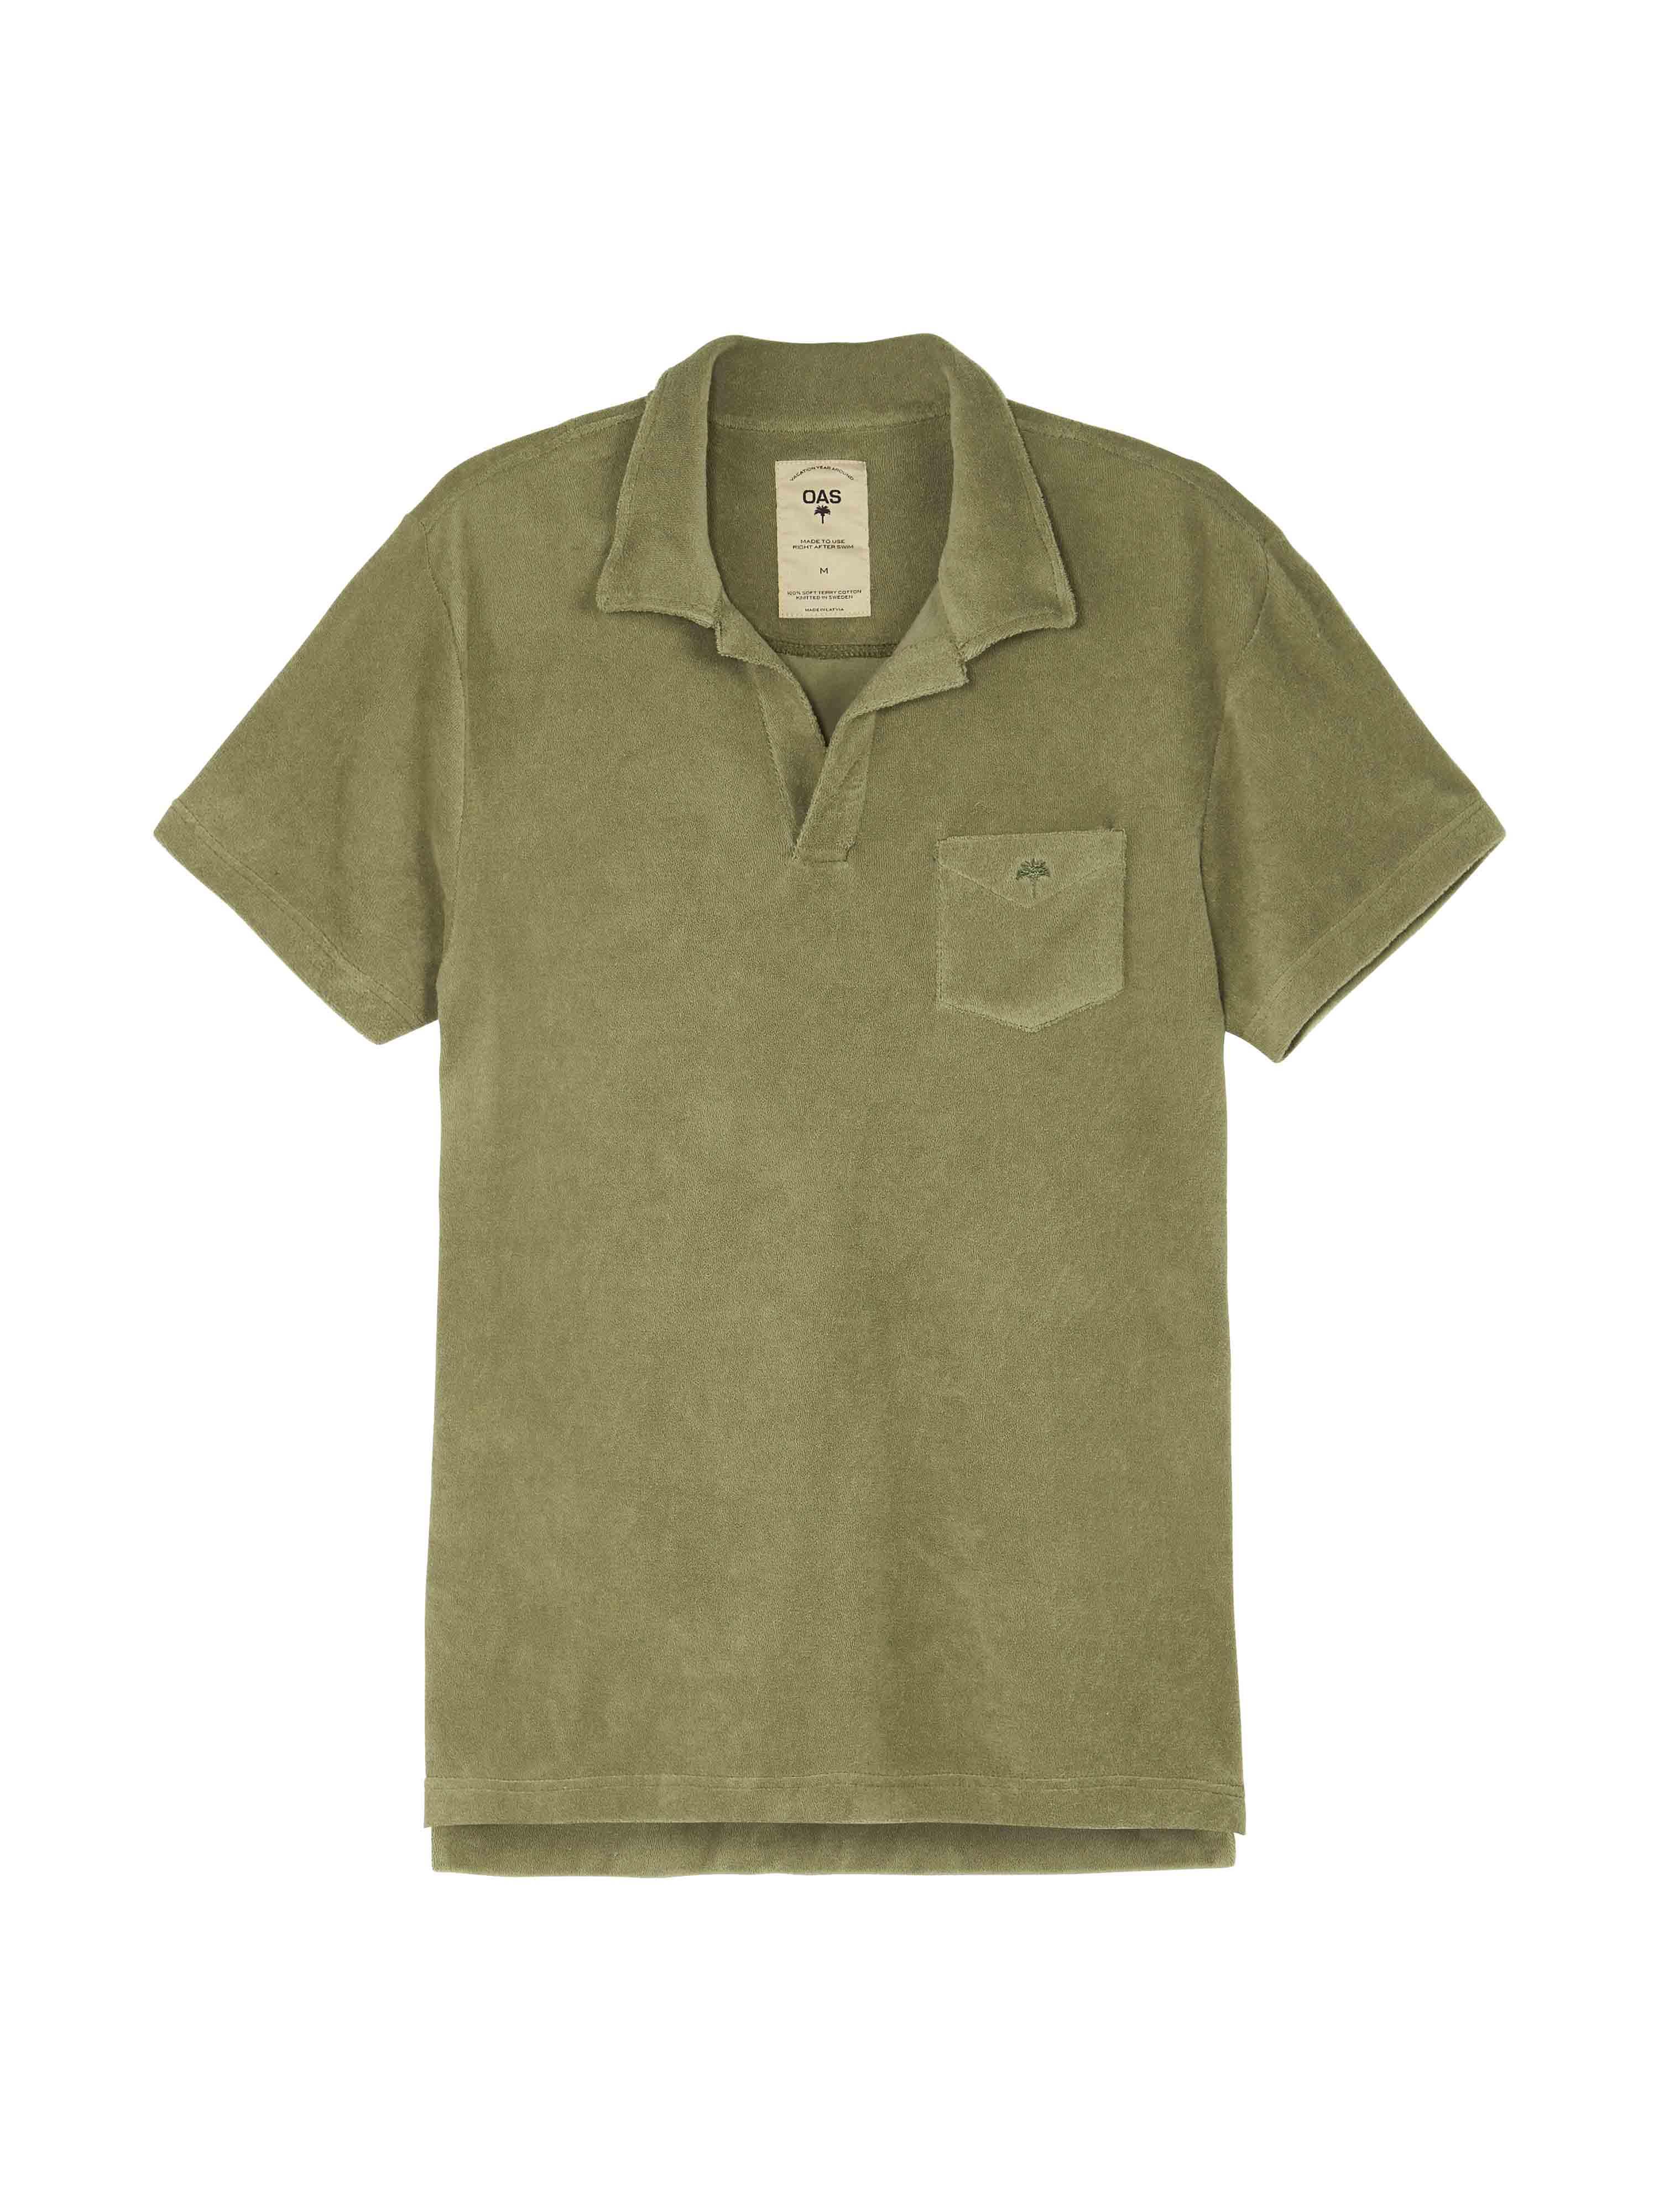 Solid Khaki Terry Shirt